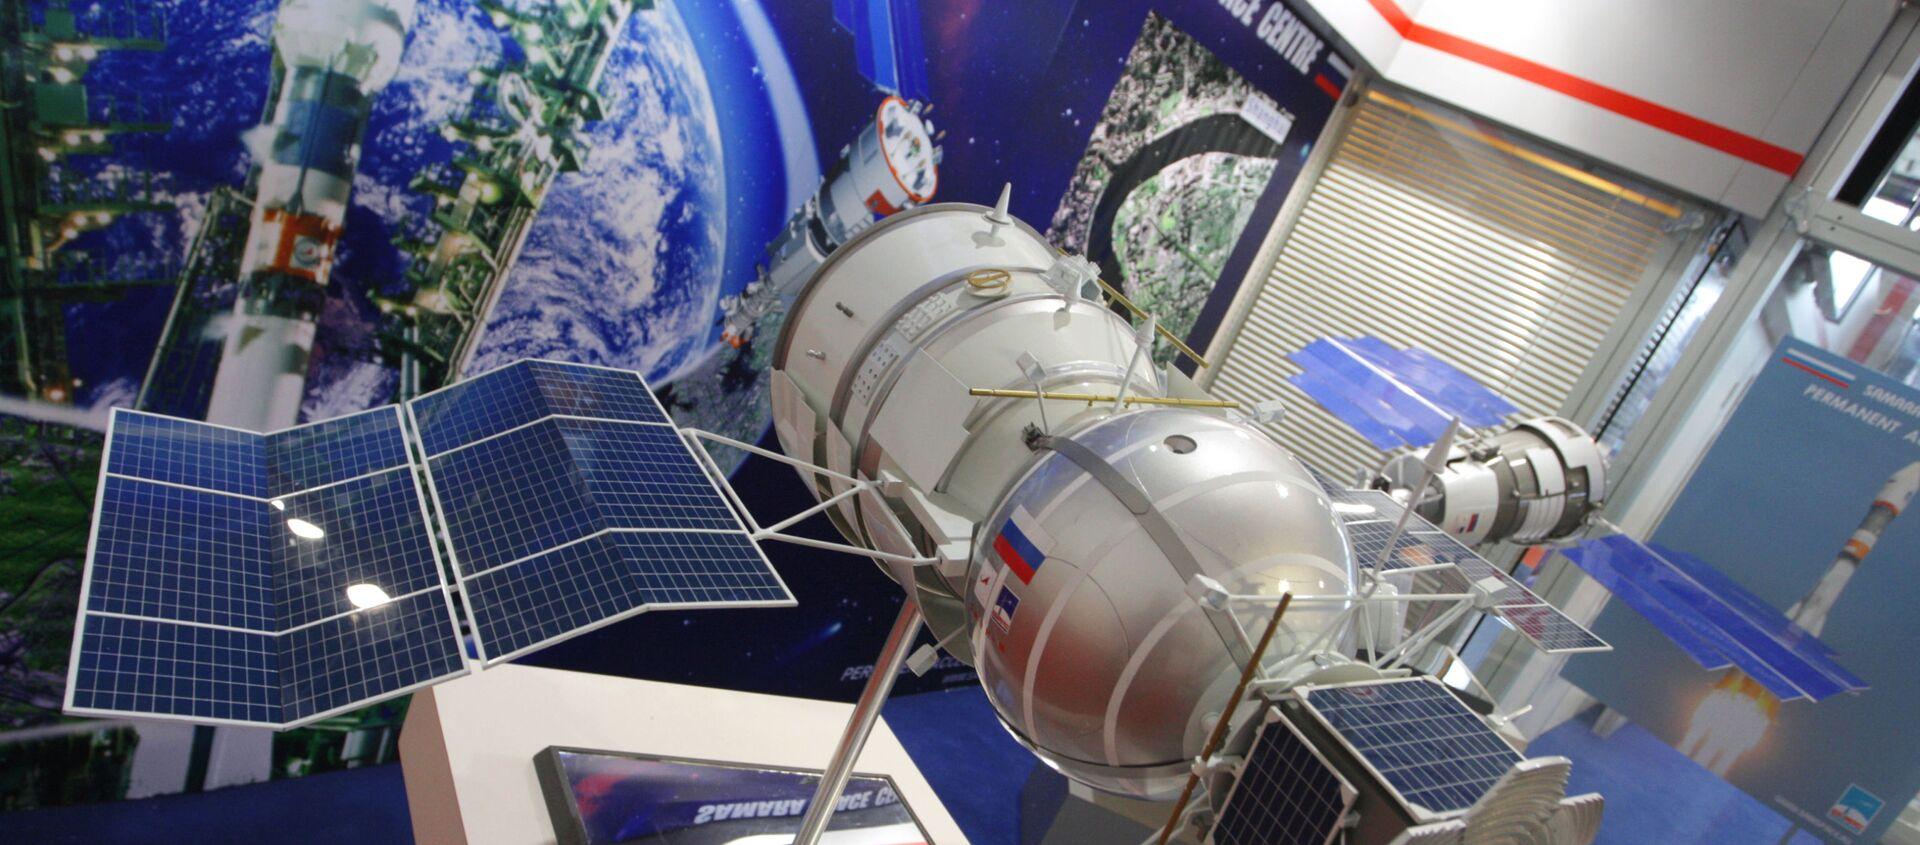 Un modelo del biosatélite ruso Bion-M - Sputnik Mundo, 1920, 10.02.2021